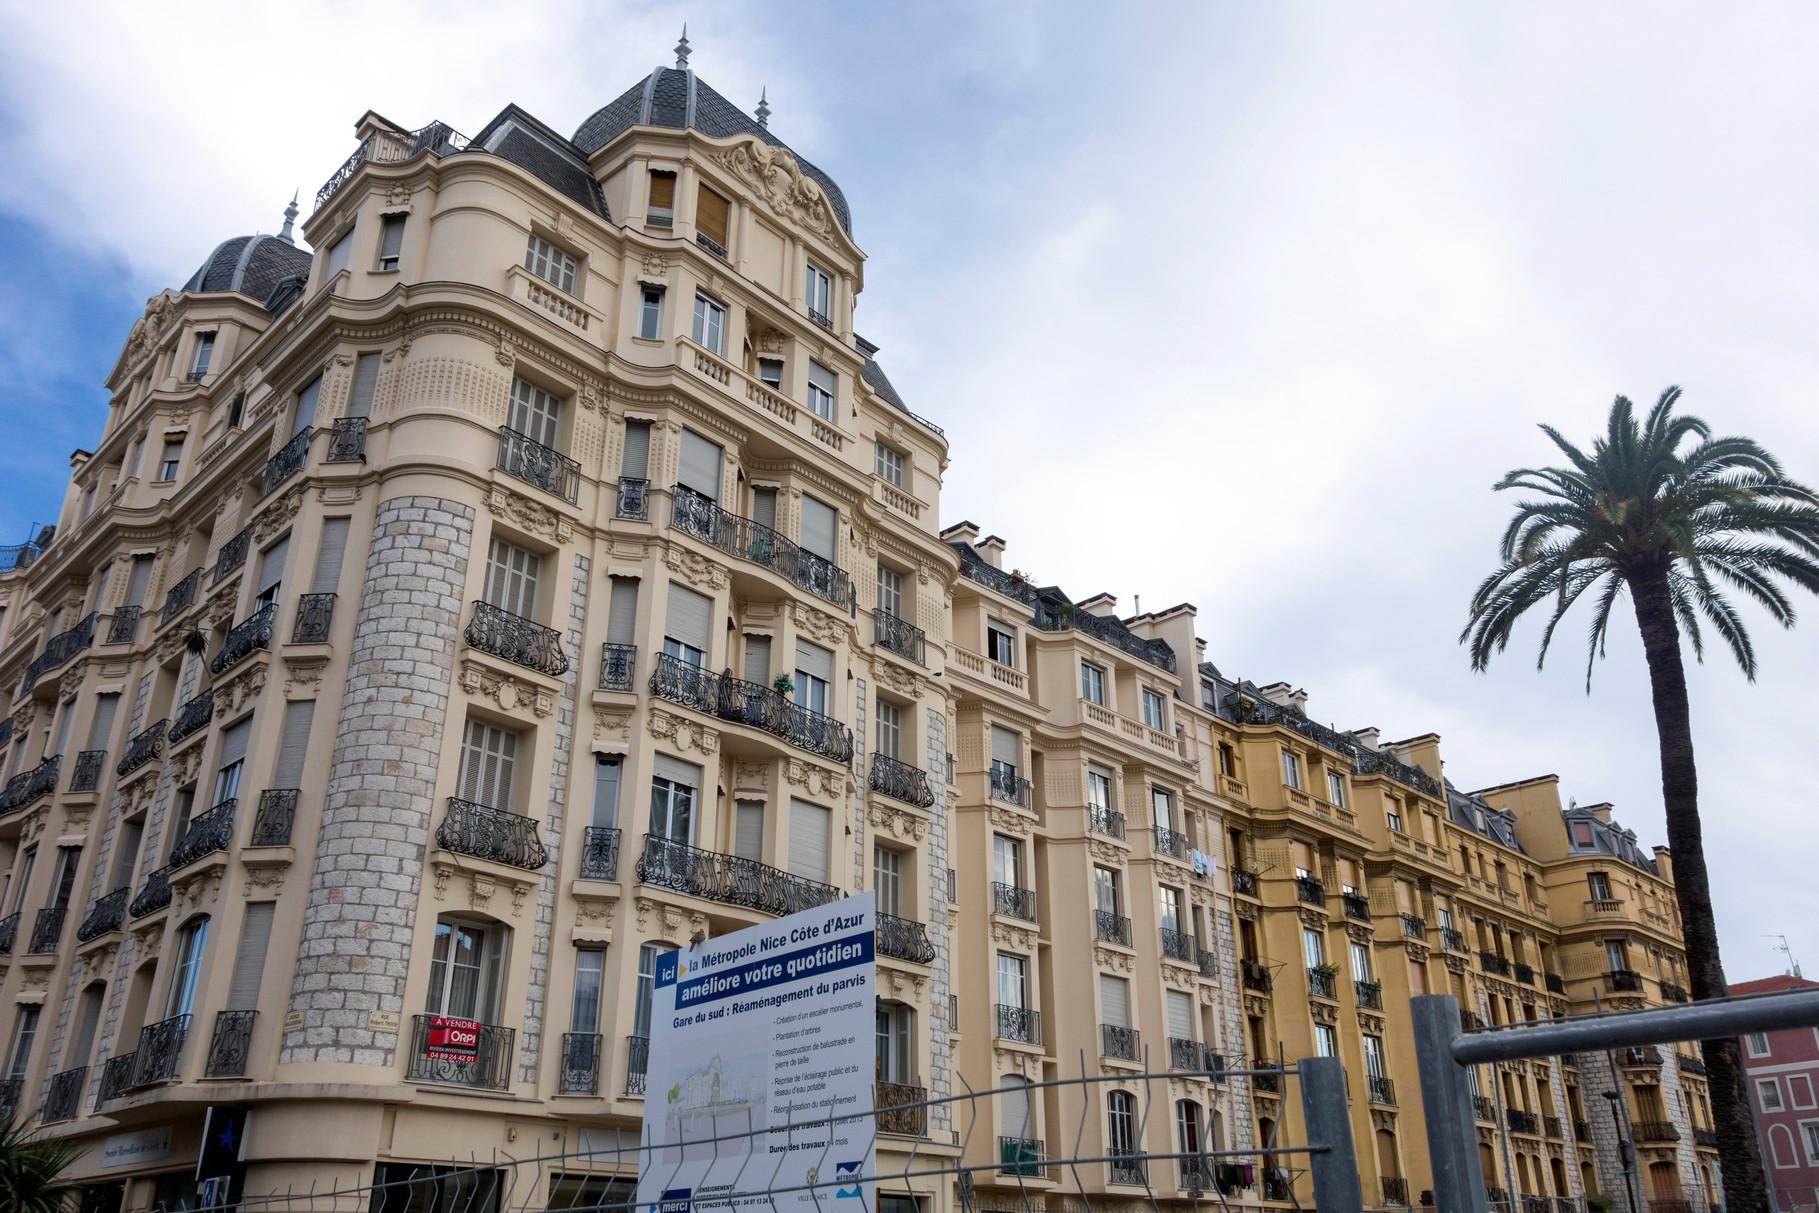 Stadterneuerung - Sanierung alter Fassaden